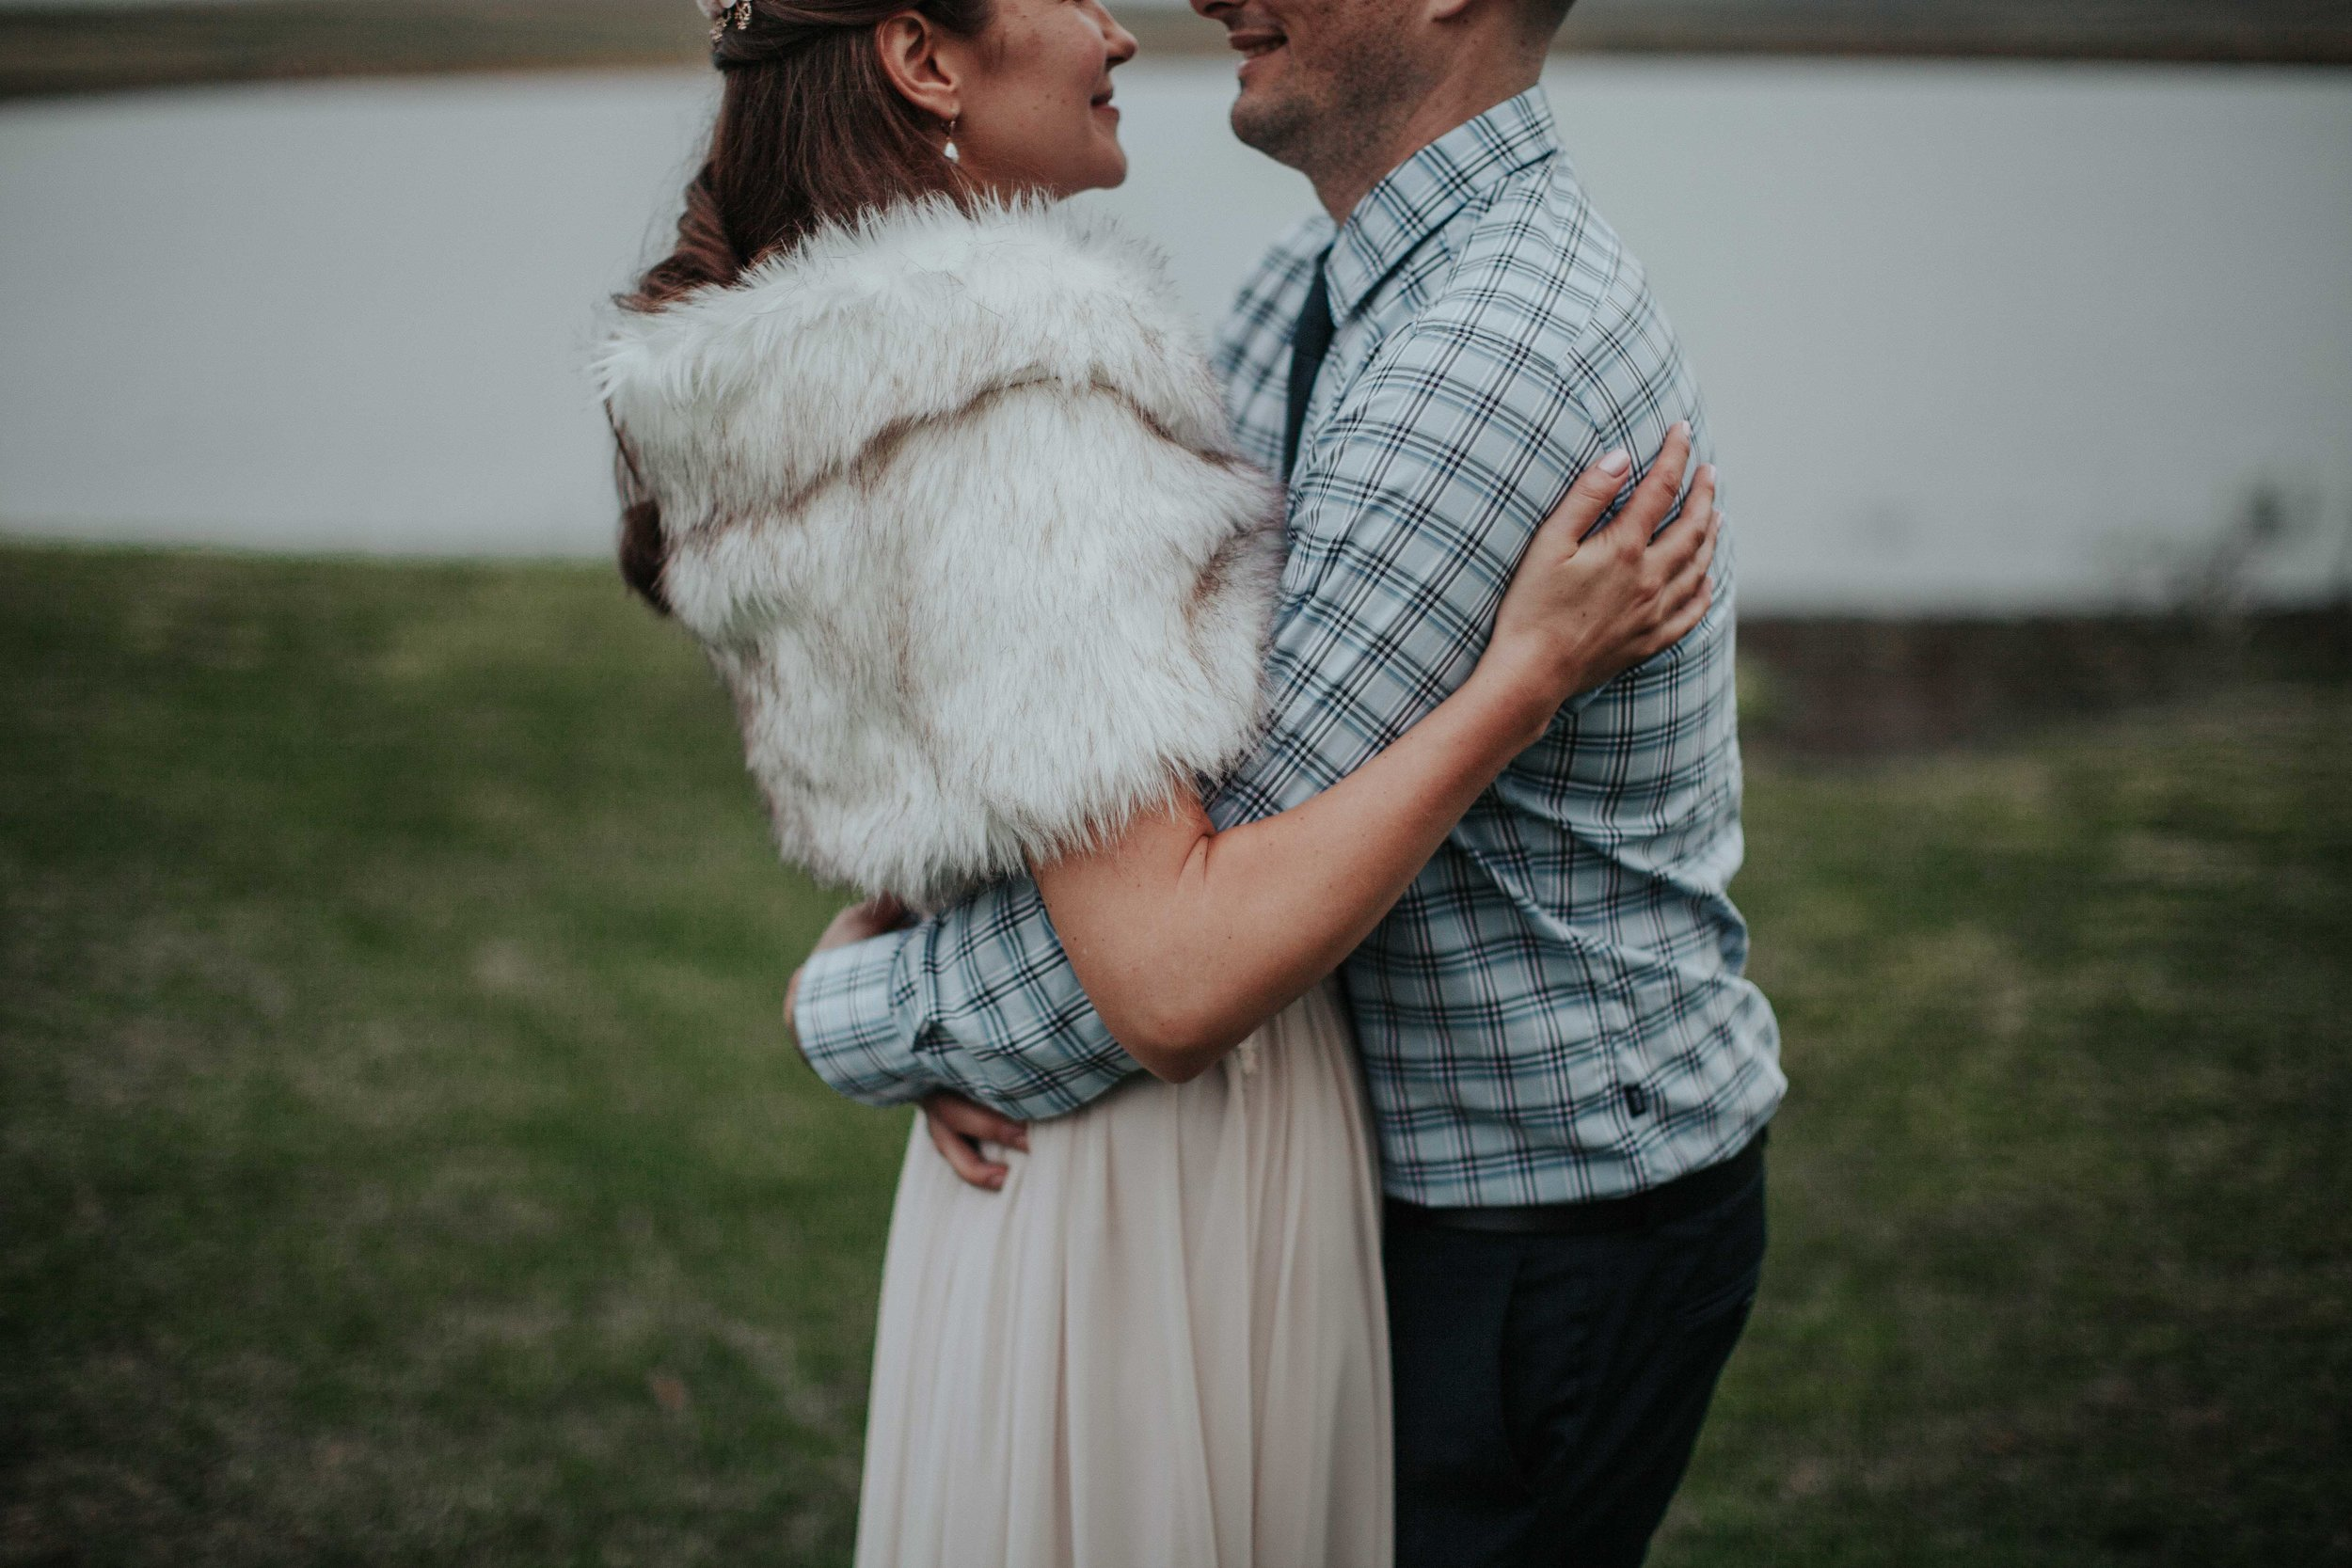 Kristi Smith Photography - Wedding Photographer - Kev and Kirst 16.jpg